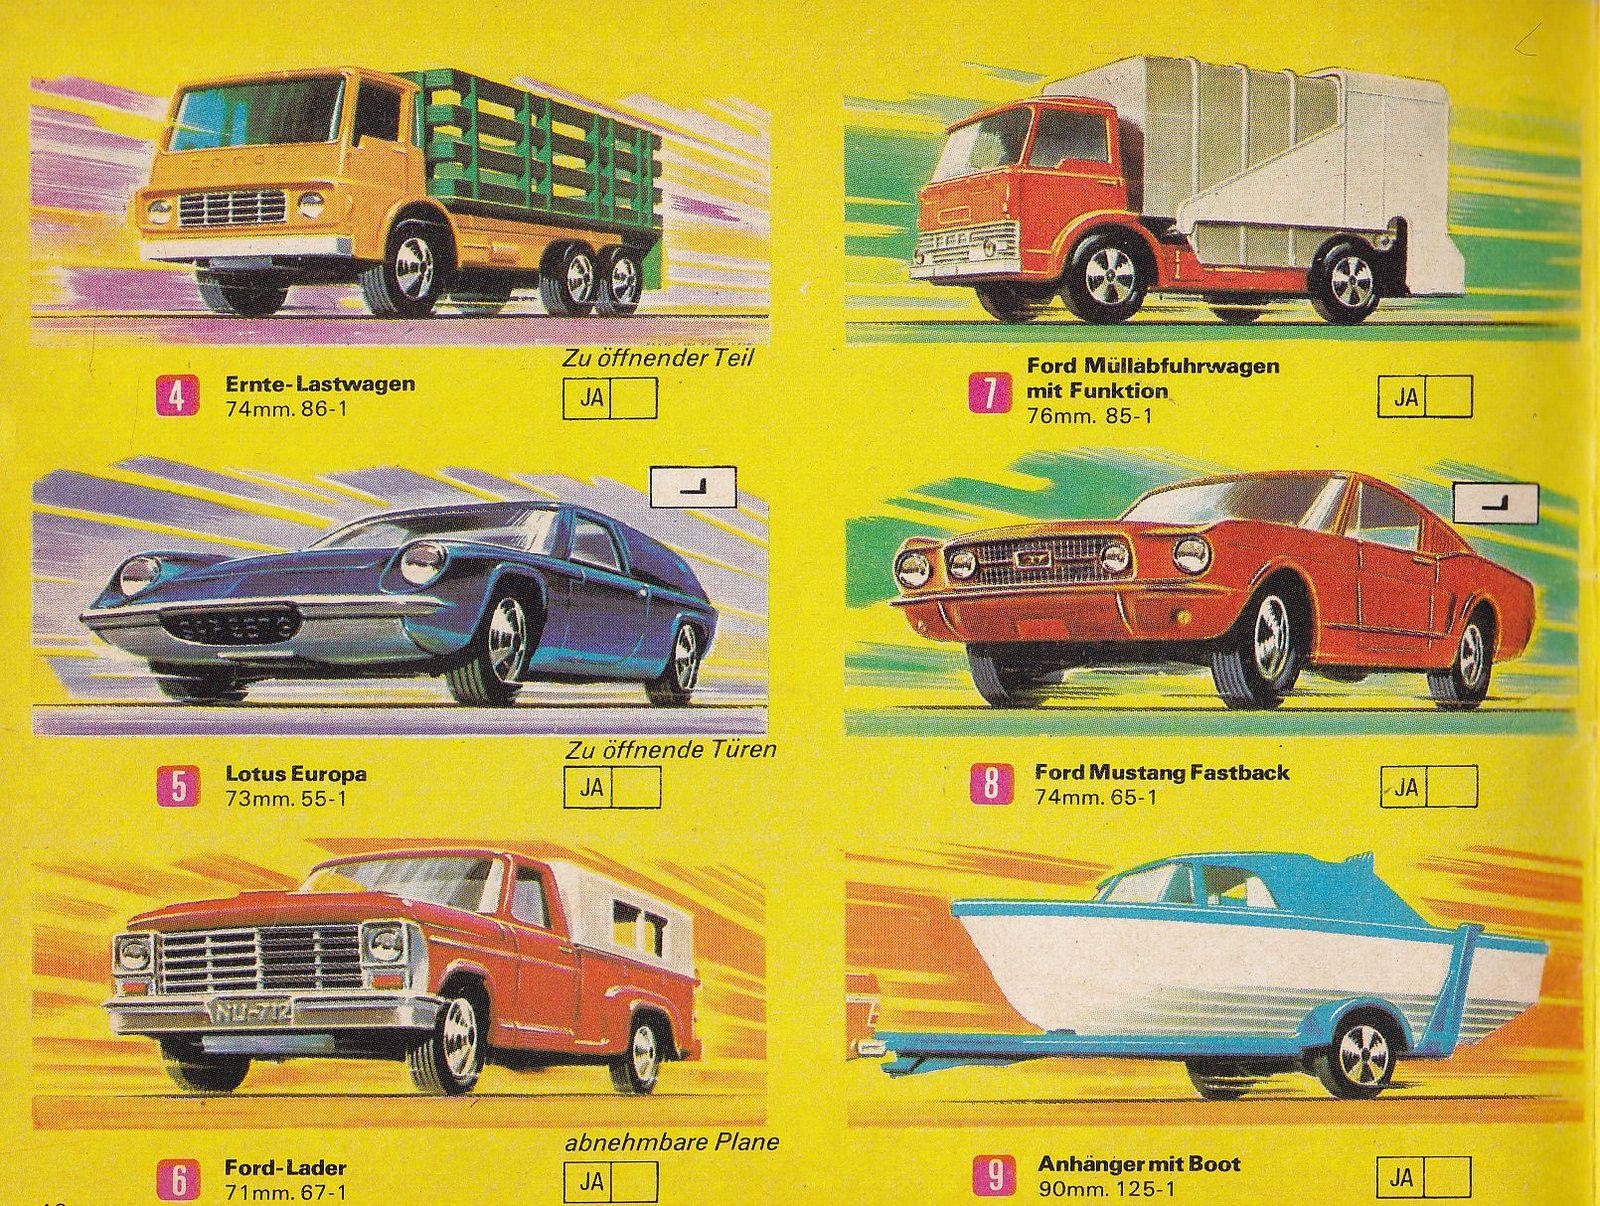 Matchbox Superfast Sammler Katalog 1970 Seite 18 Matchbox Corgi Toys Matchbox Cars